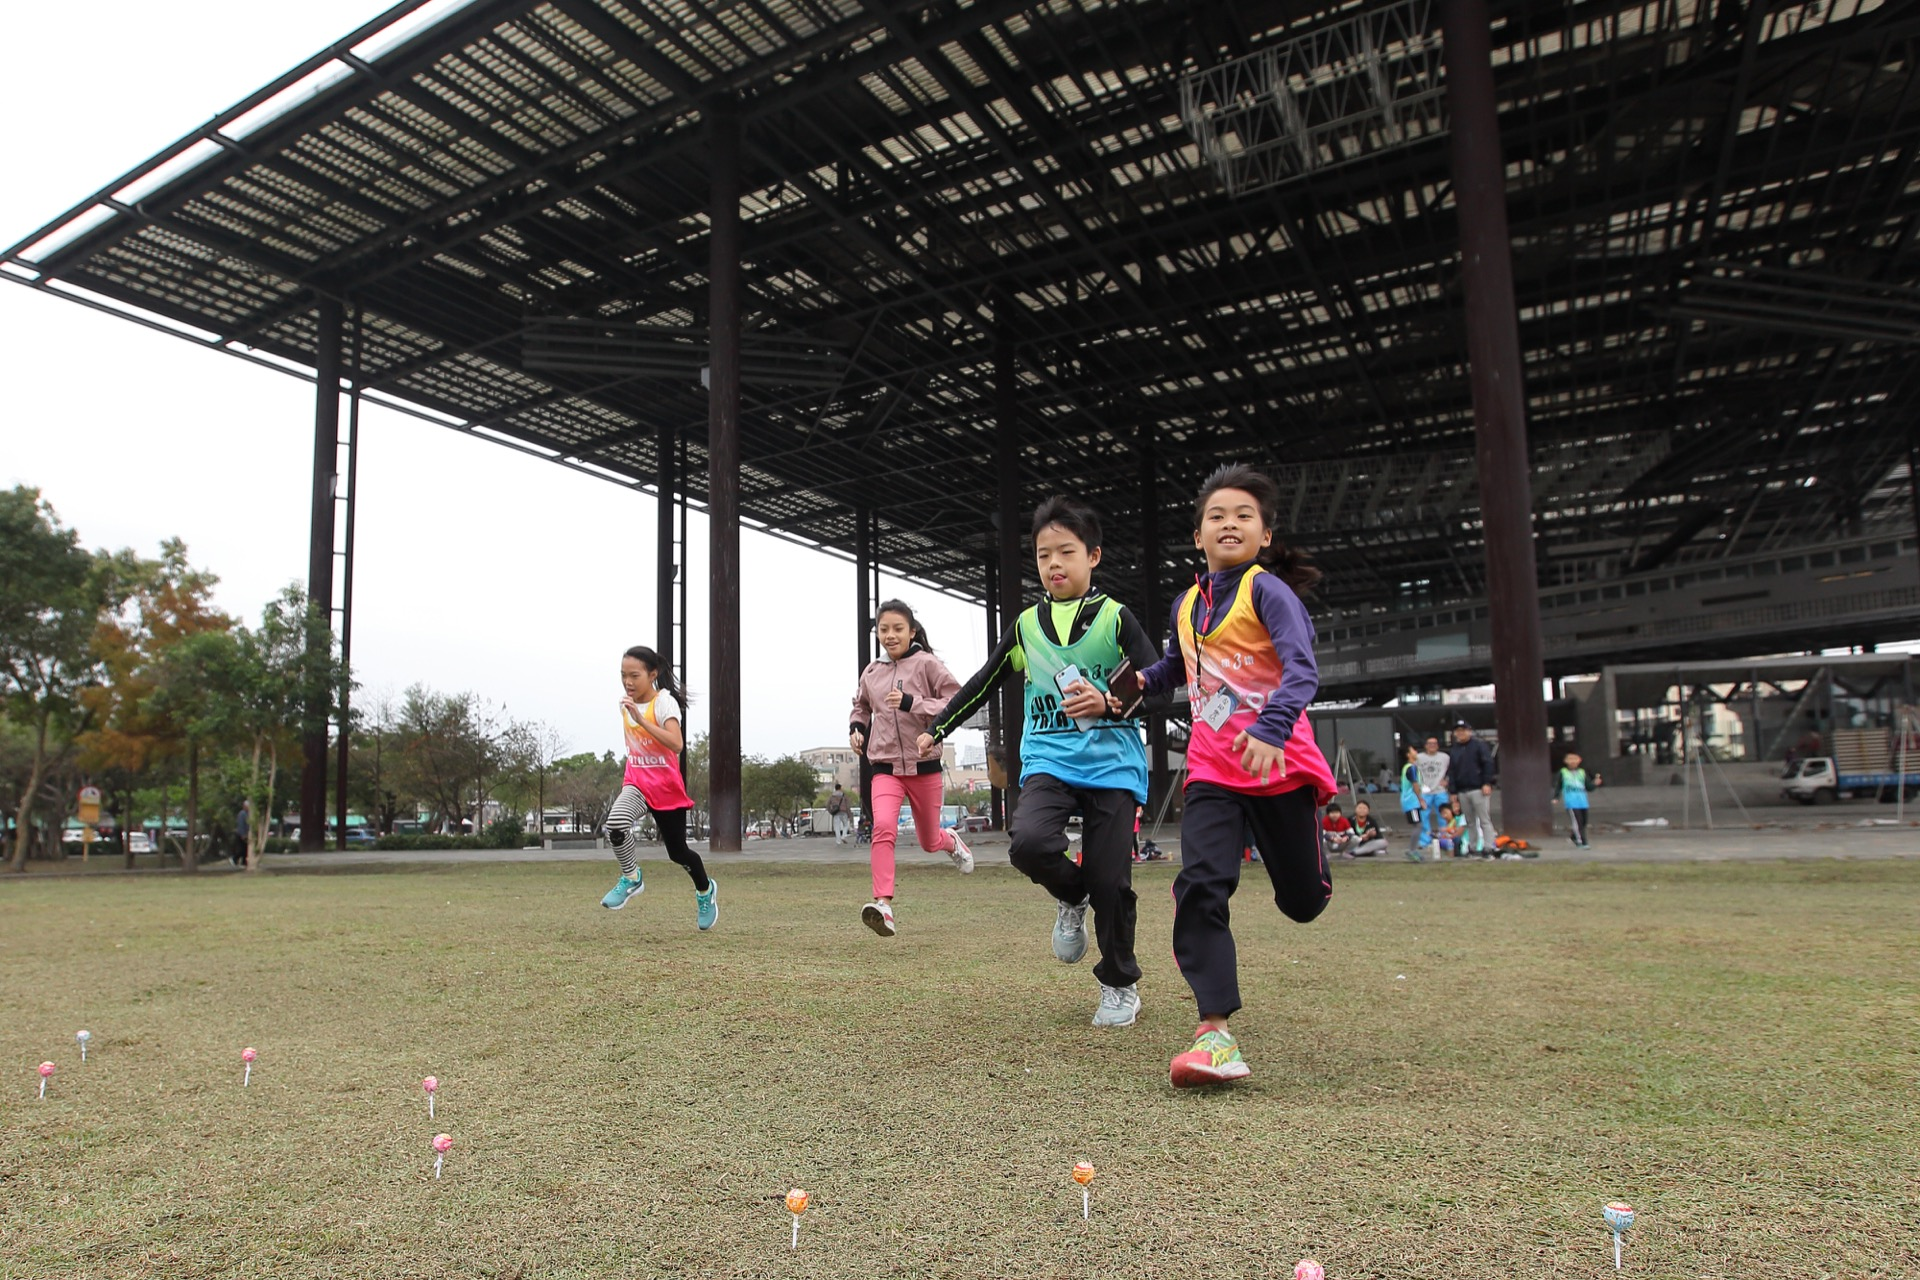 德築-DEZU-project-Fun3sport-children-outdoor-activity-20